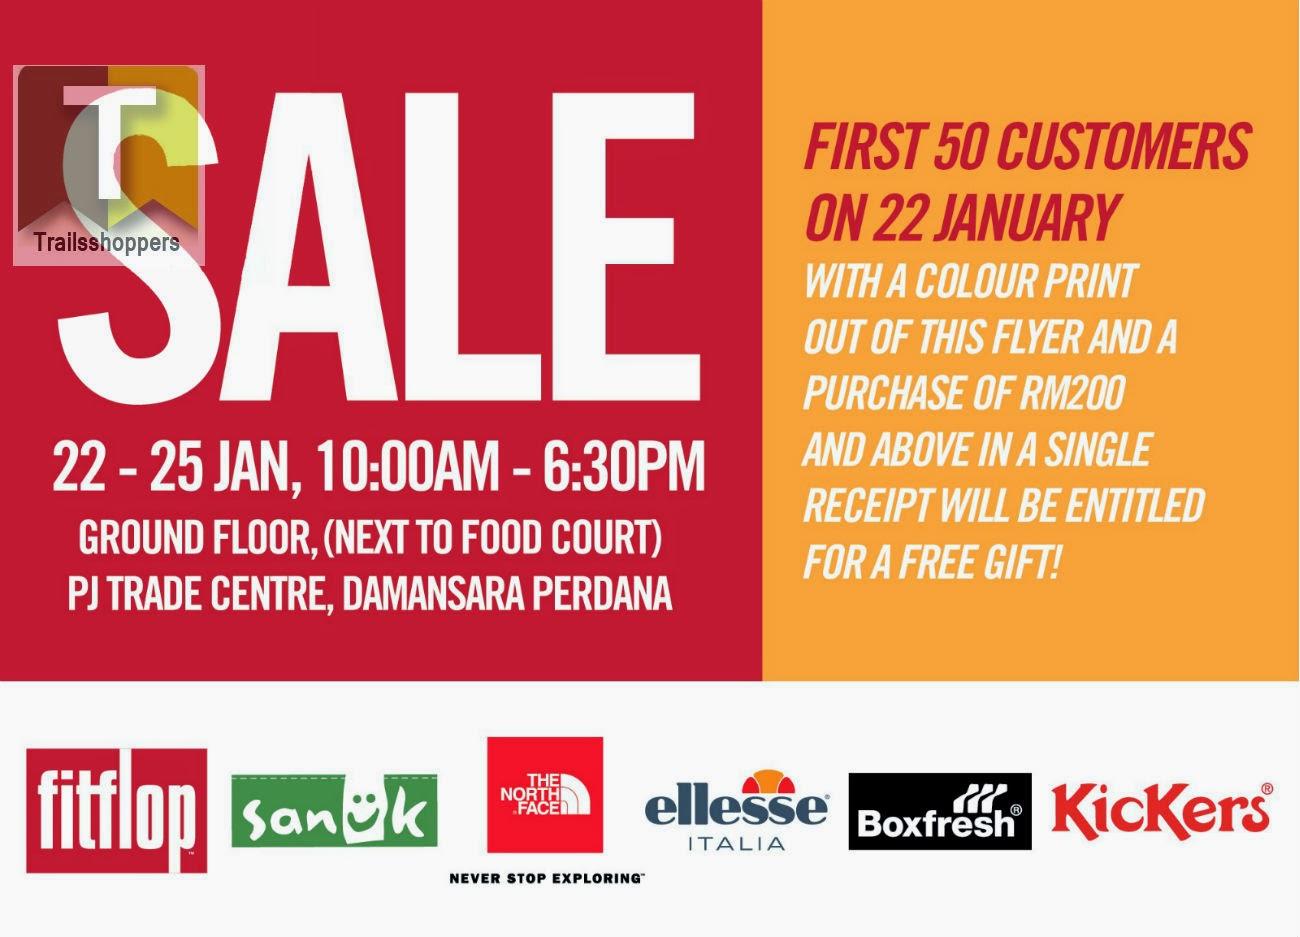 Branded Warehouse Sale pj trade centre damansara perdana